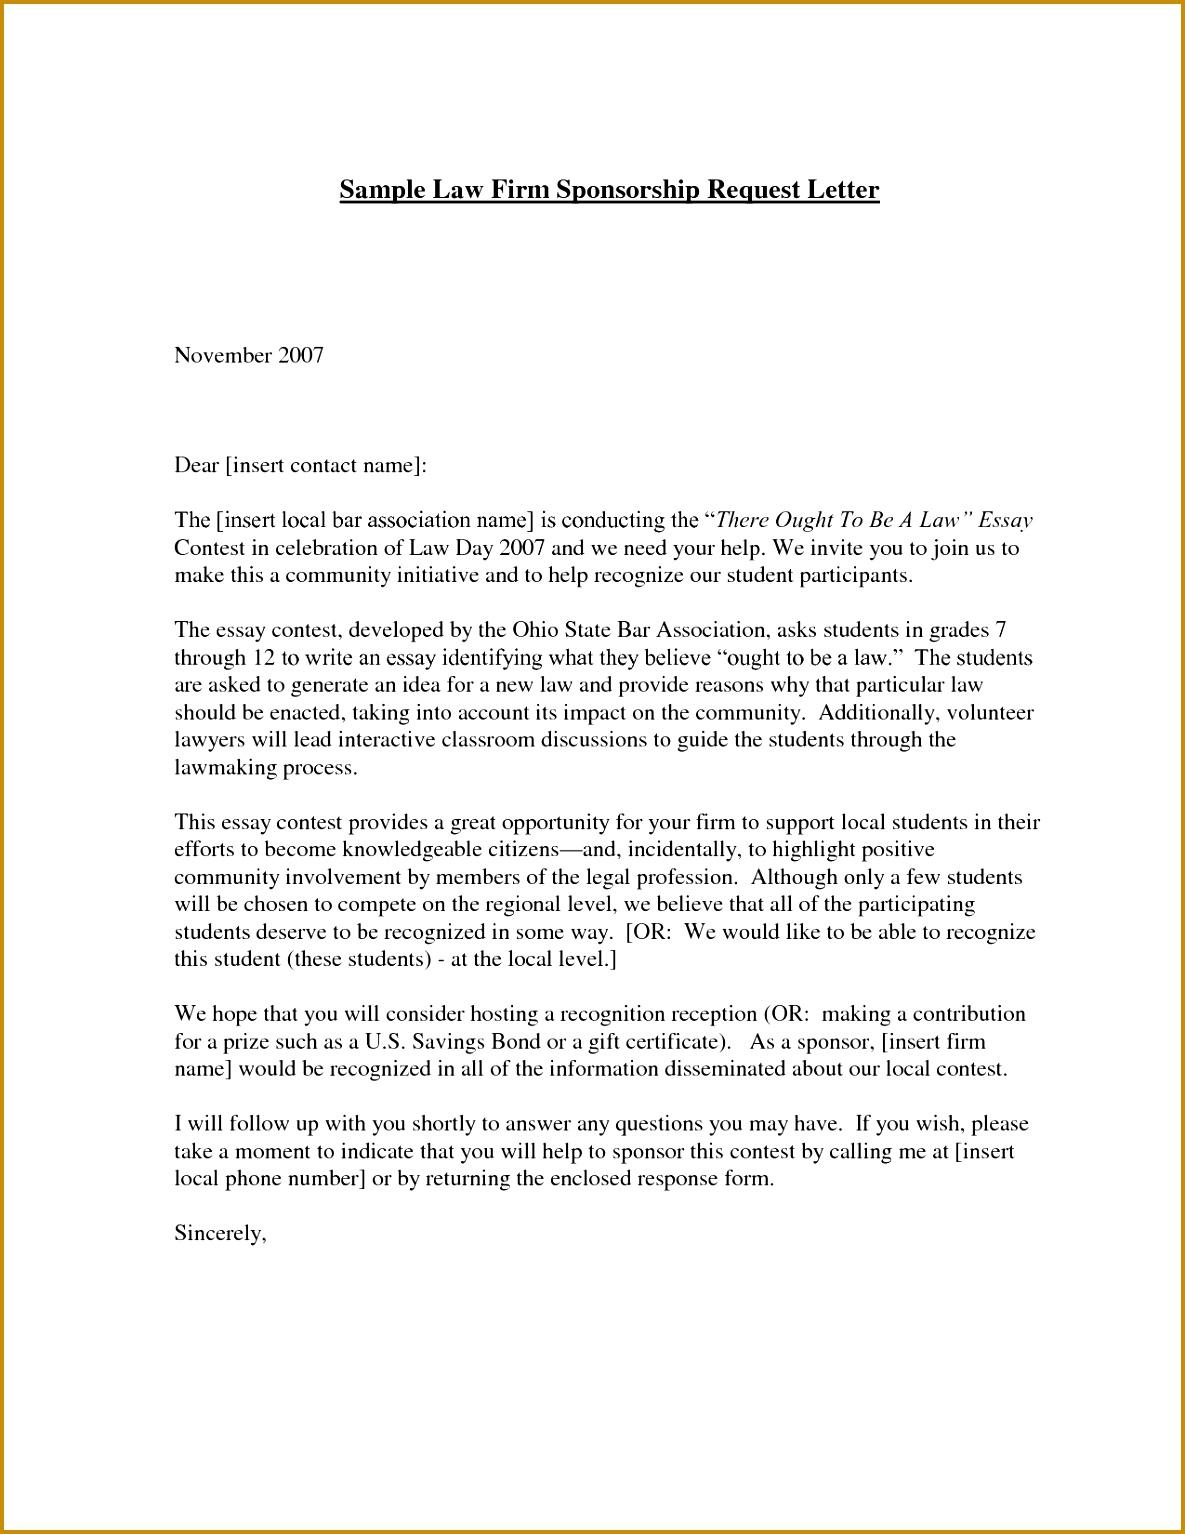 request for sponsorship letter 15341185